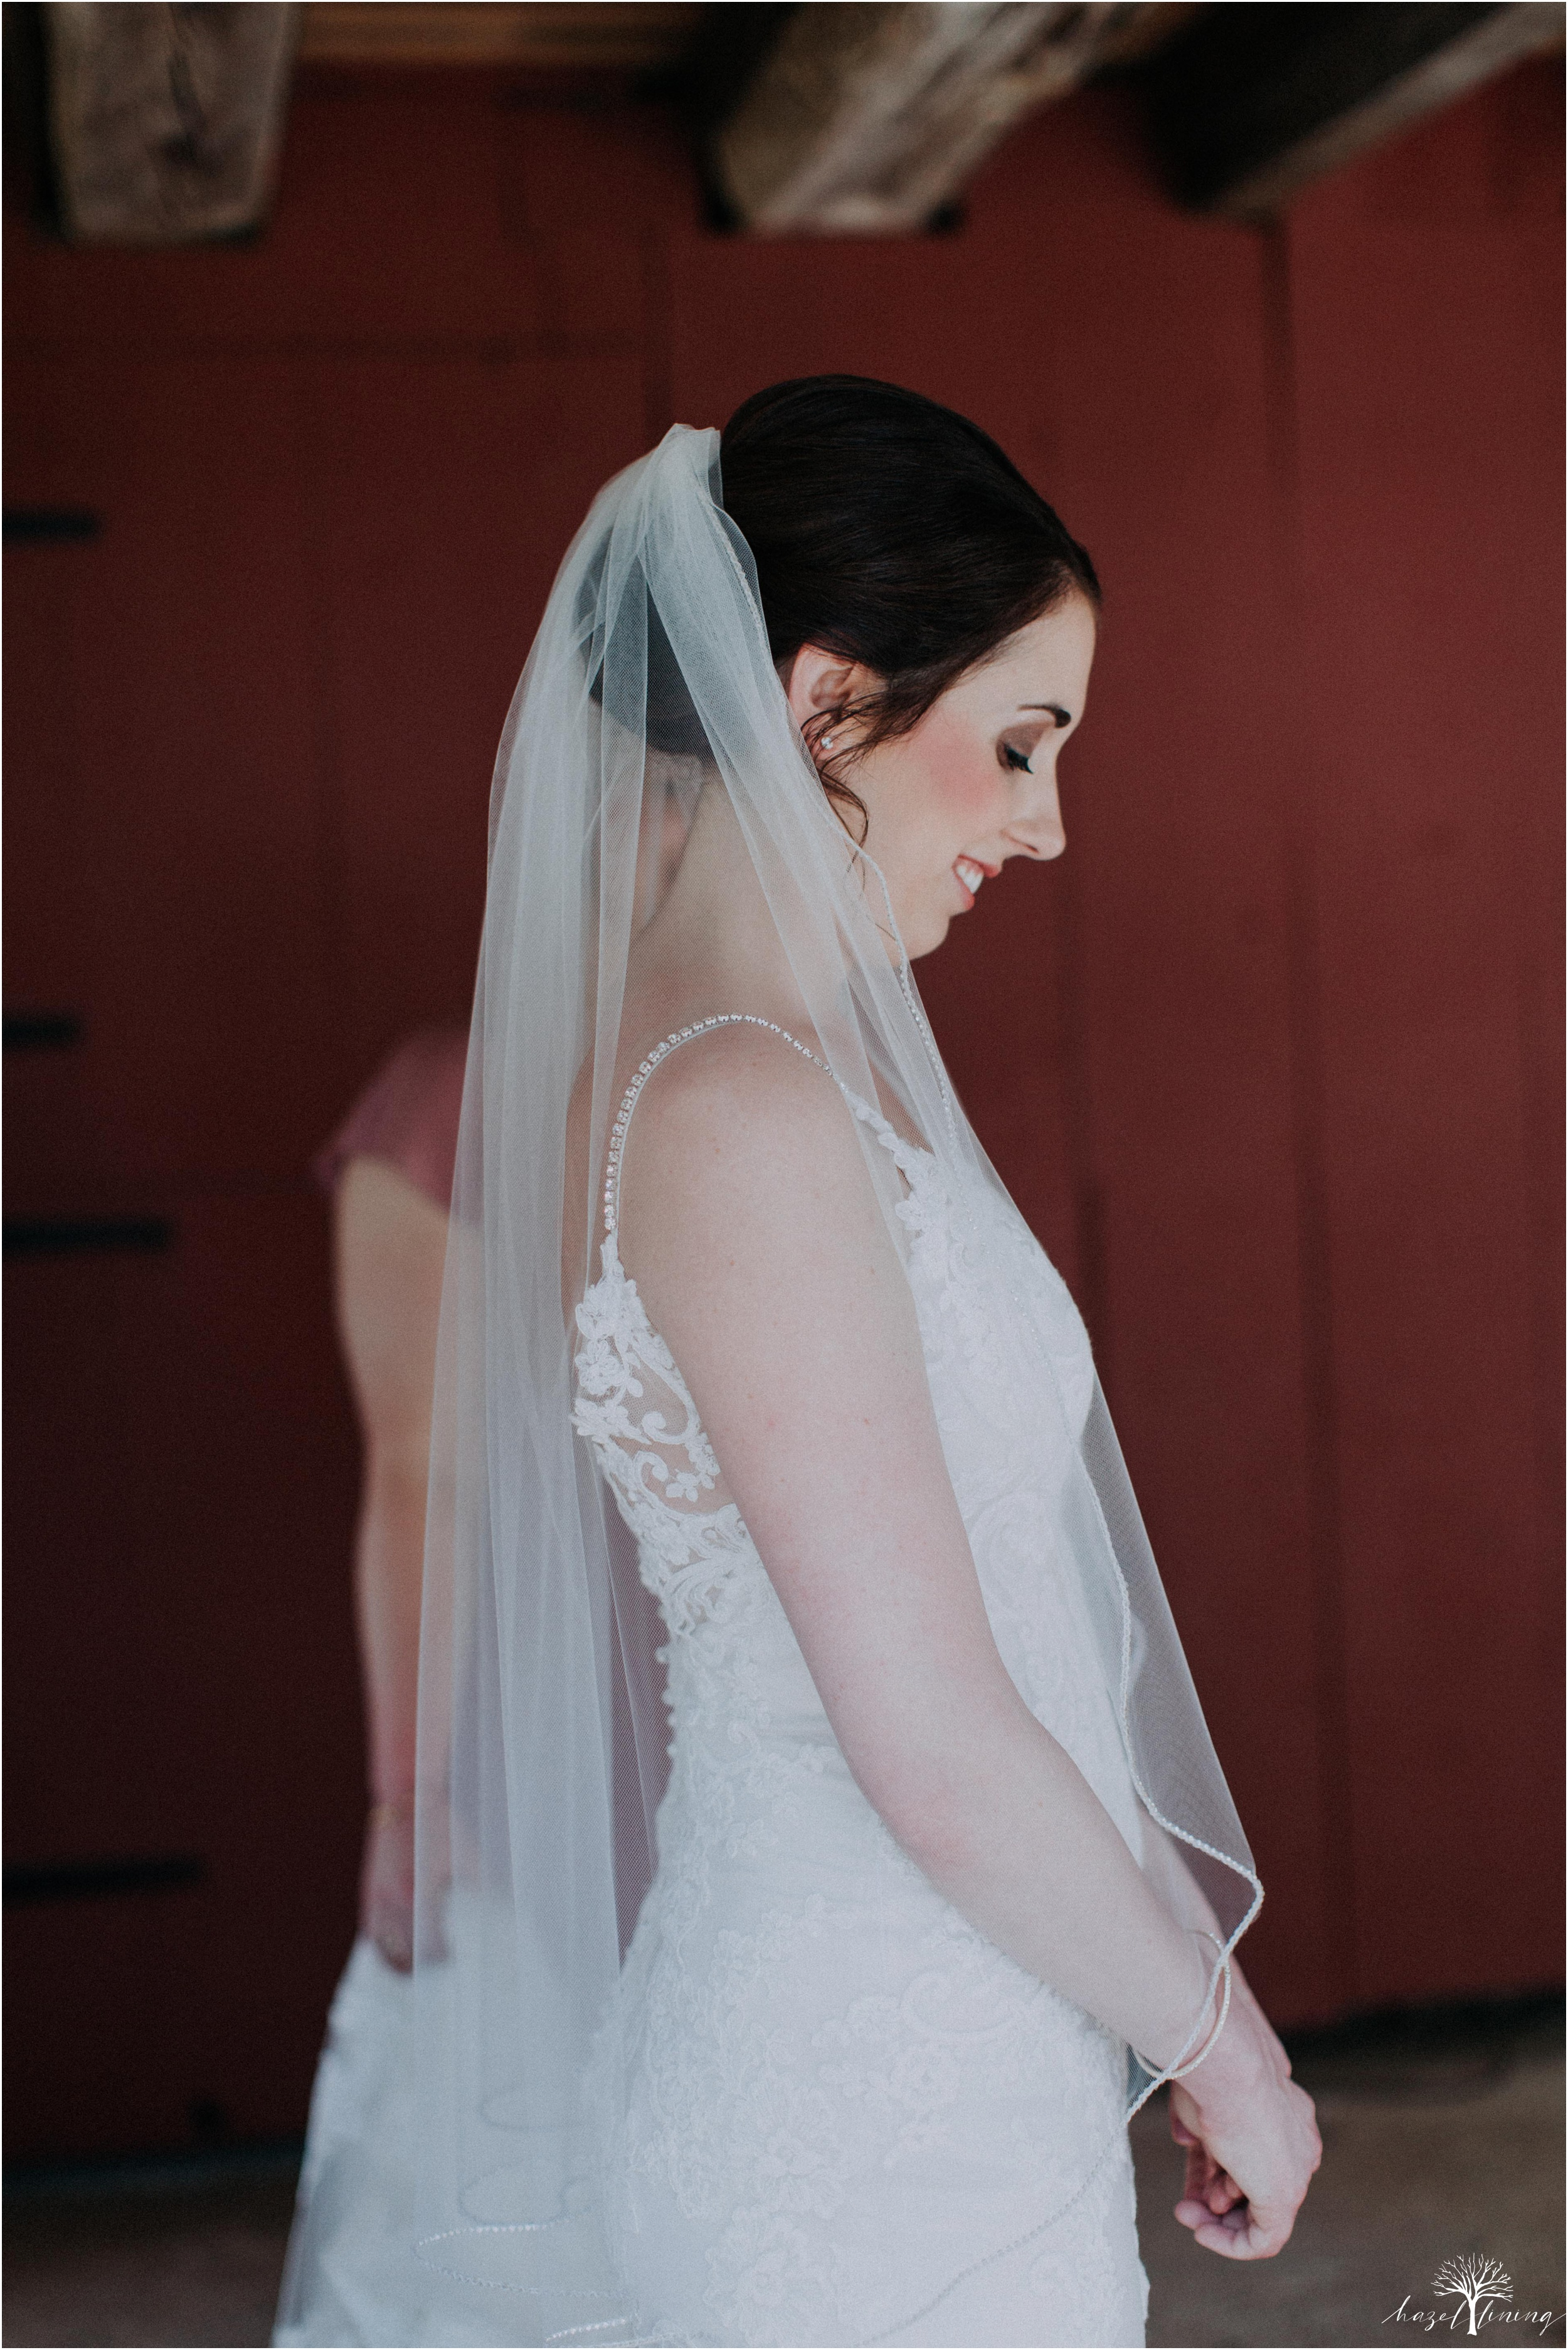 hazel-lining-travel-wedding-elopement-photography-lisa-landon-shoemaker-the-farm-bakery-and-events-bucks-county-quakertown-pennsylvania-summer-country-outdoor-farm-wedding_0015.jpg